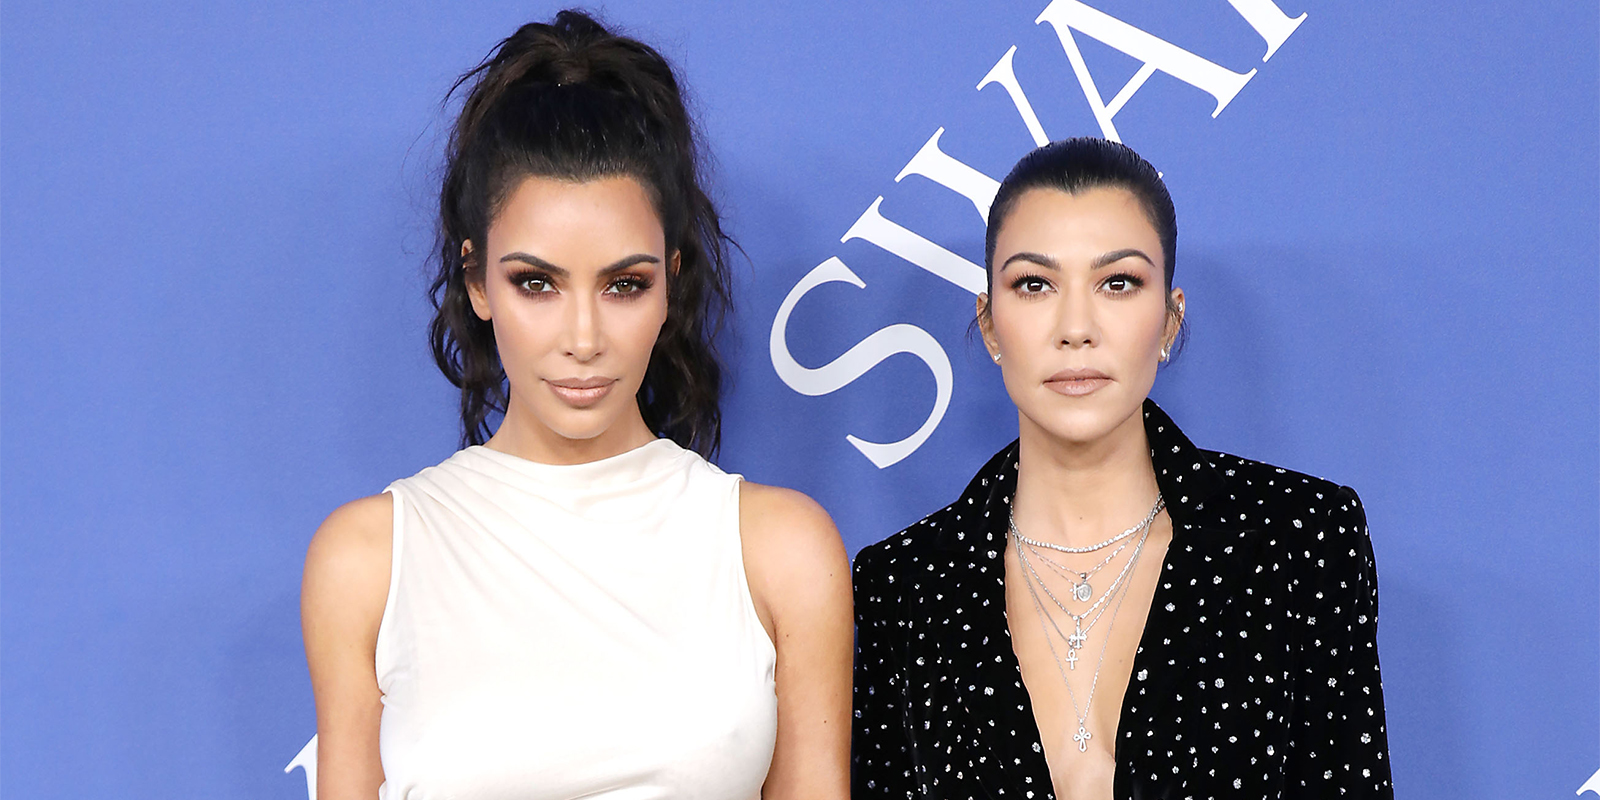 The Beauty Brand the Kardashians Made Famous Has a Futuristic Moisturizer